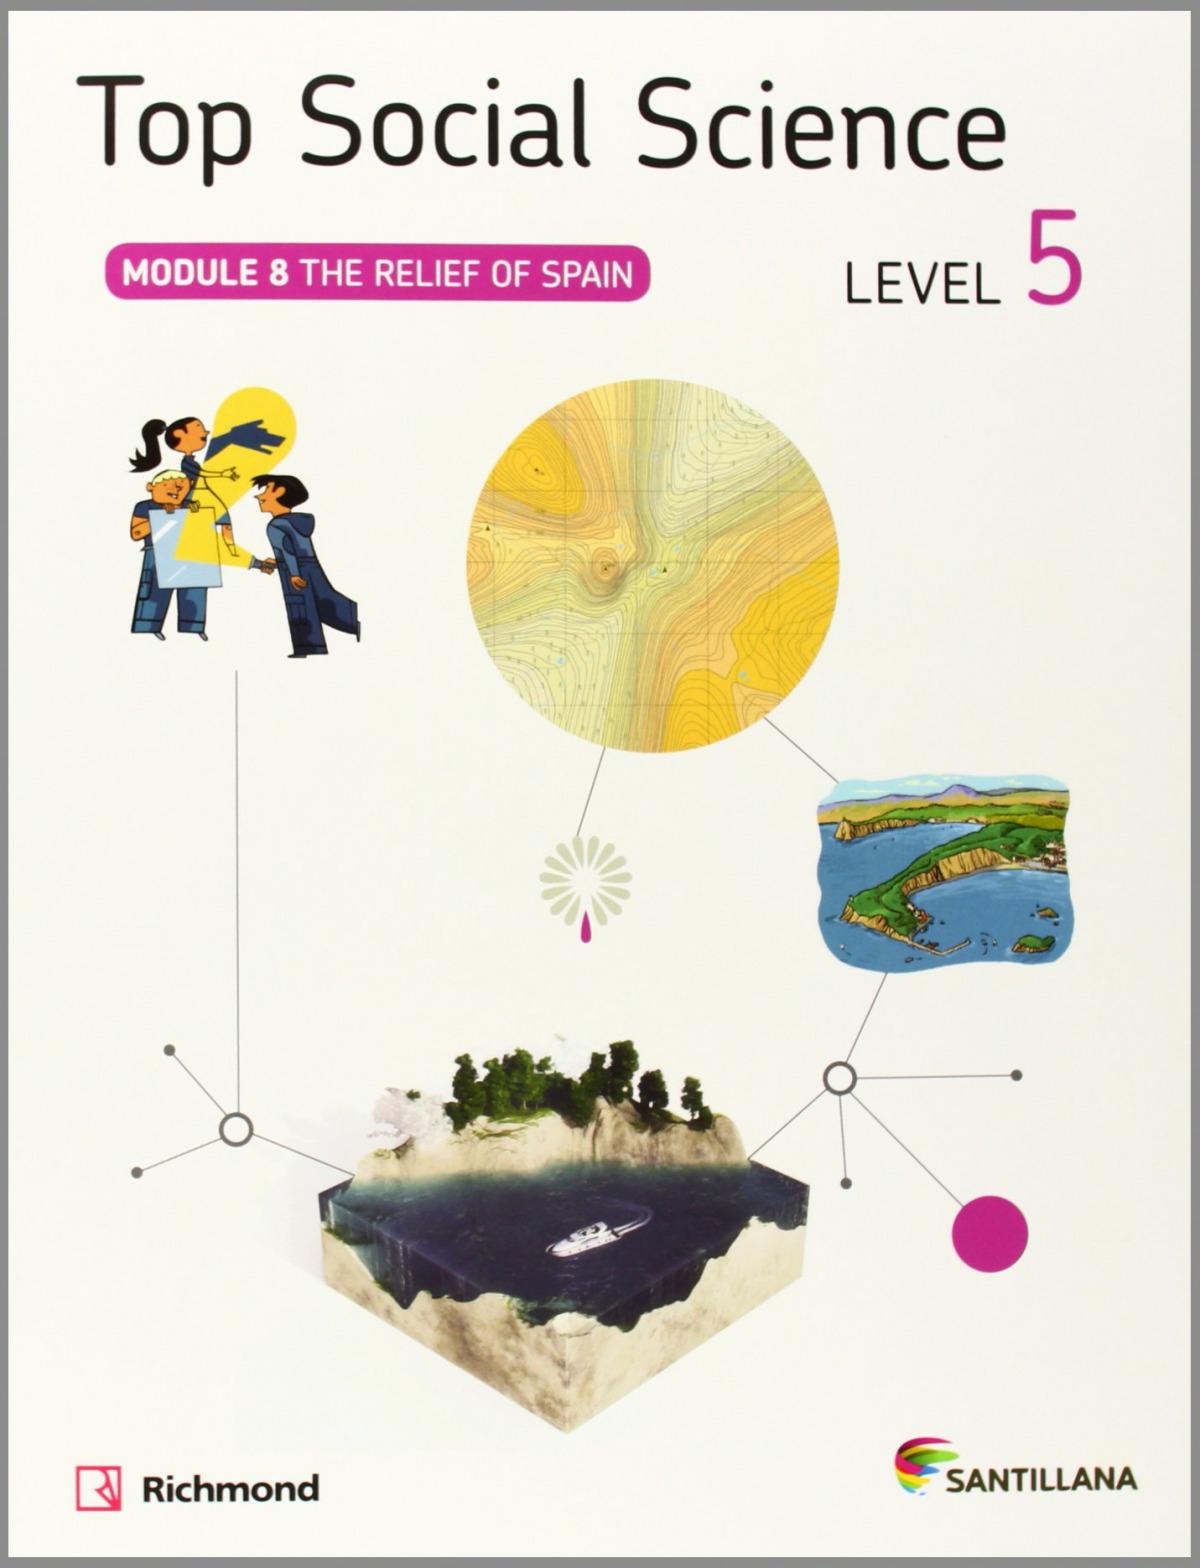 Top social science 5. Relief of Spain